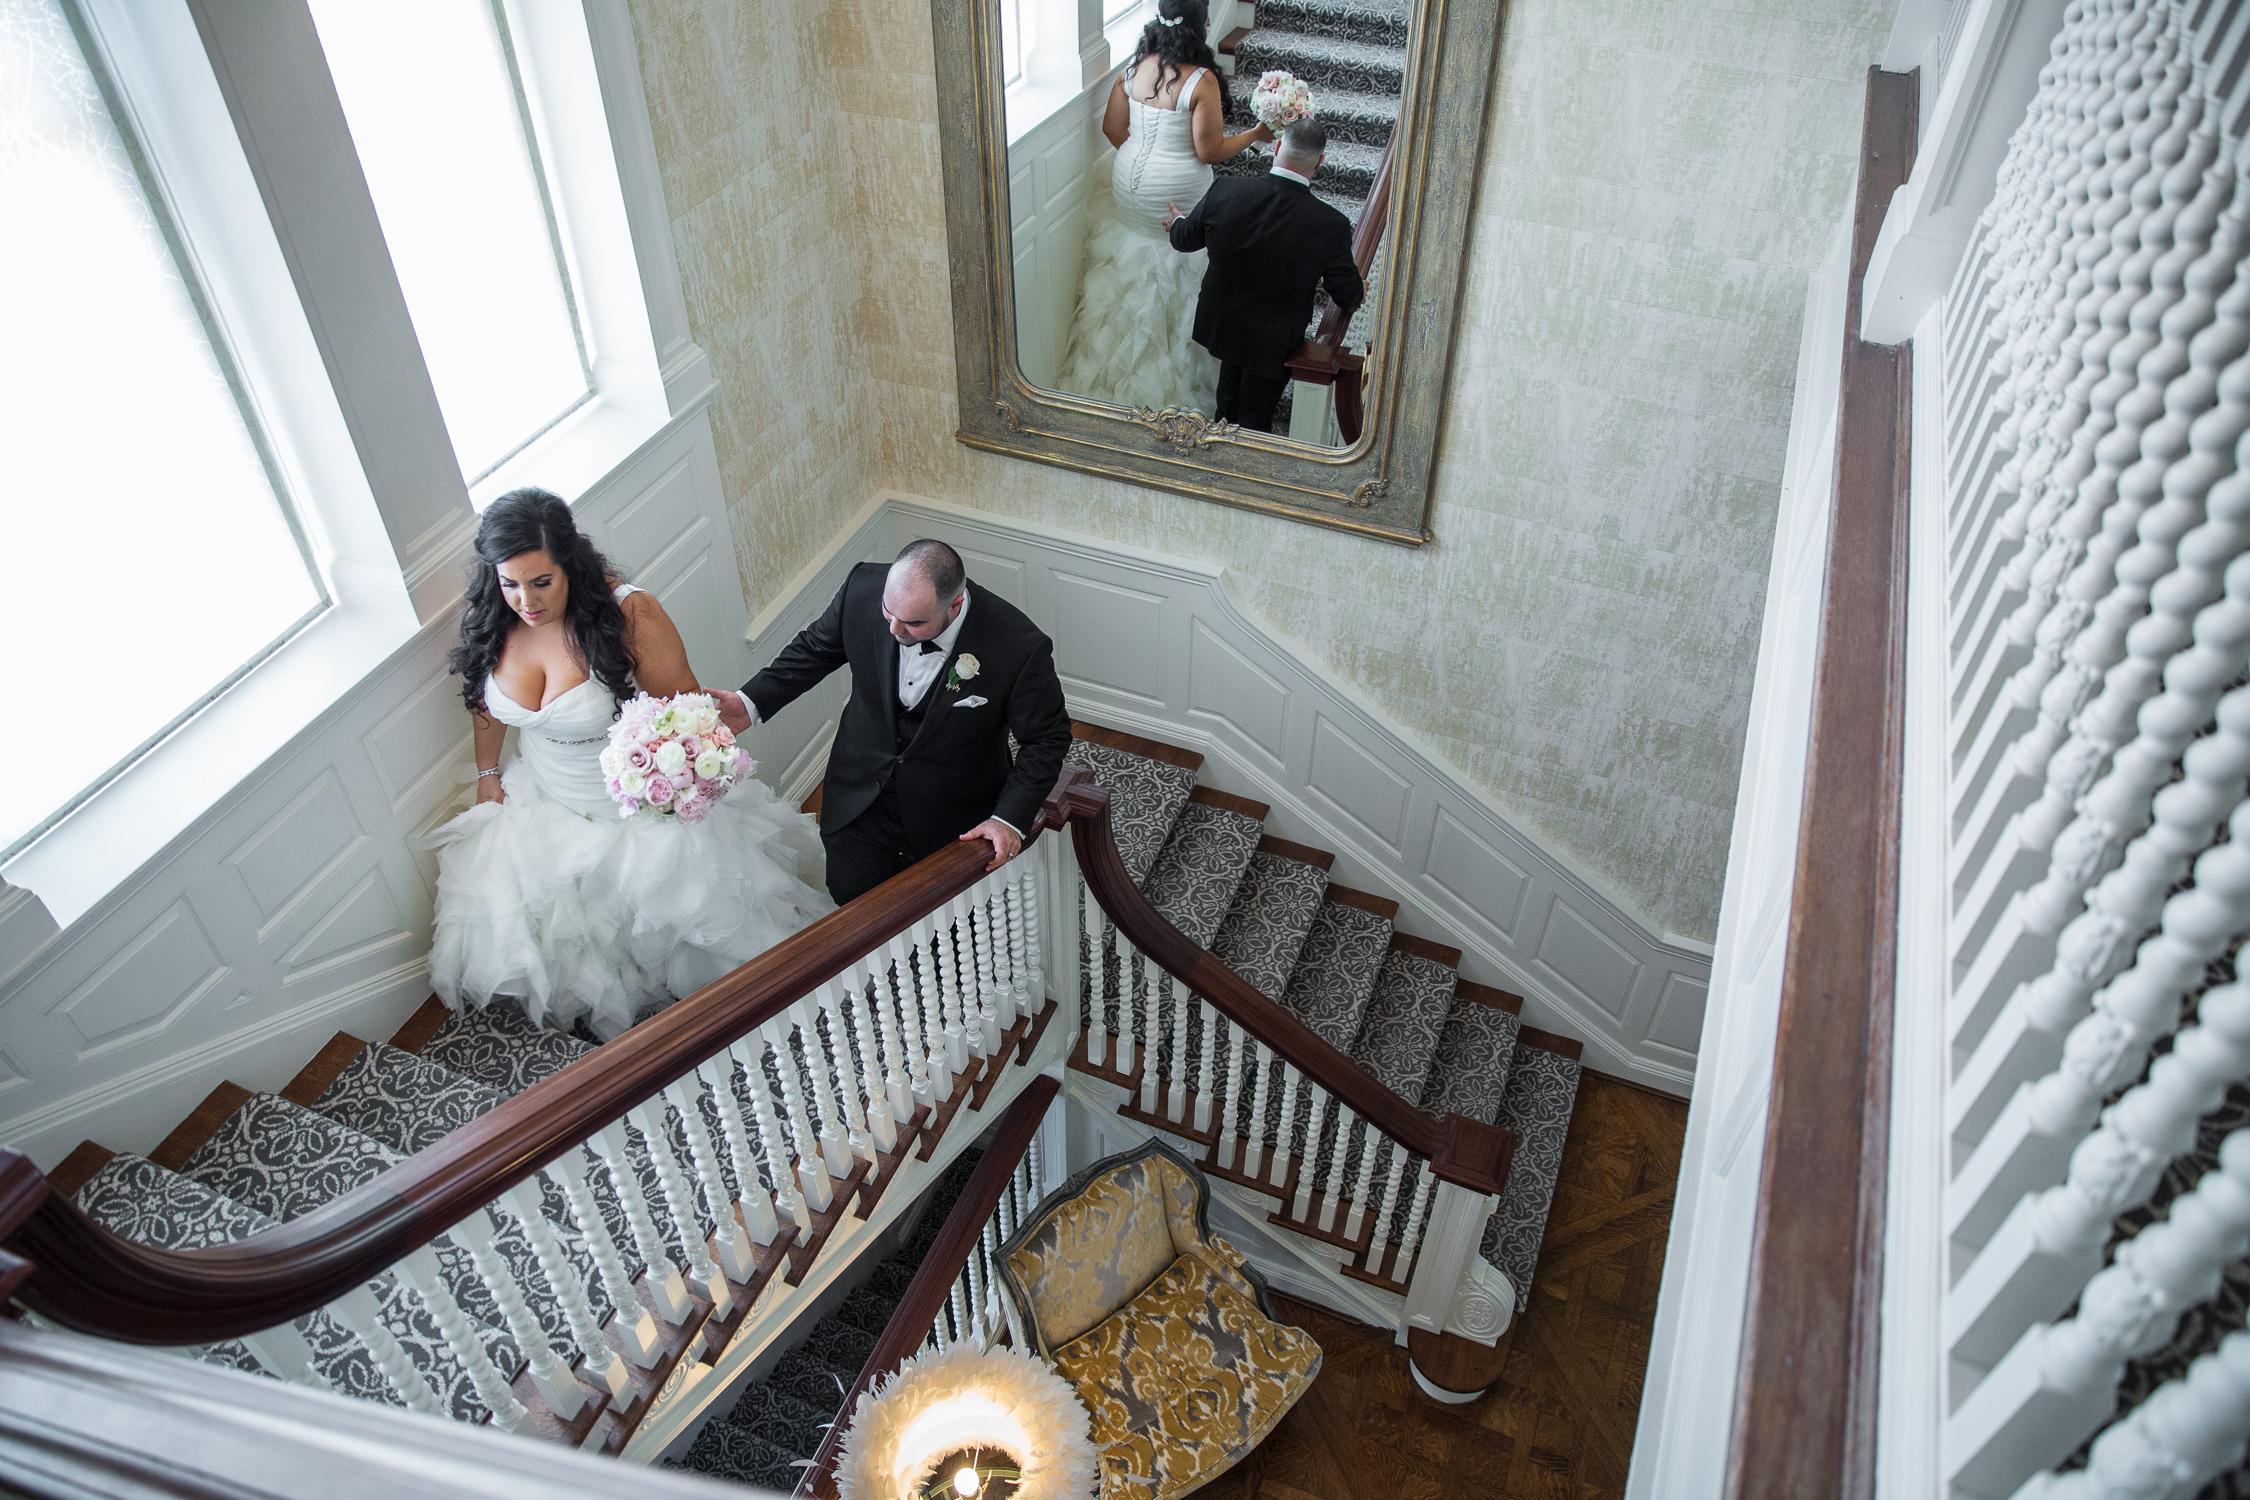 Peter-and-Marie-Wedding-Fontana-Primavera-Graydon-Hall-Manor-Toronto-Ontario-Canada-0023.jpg